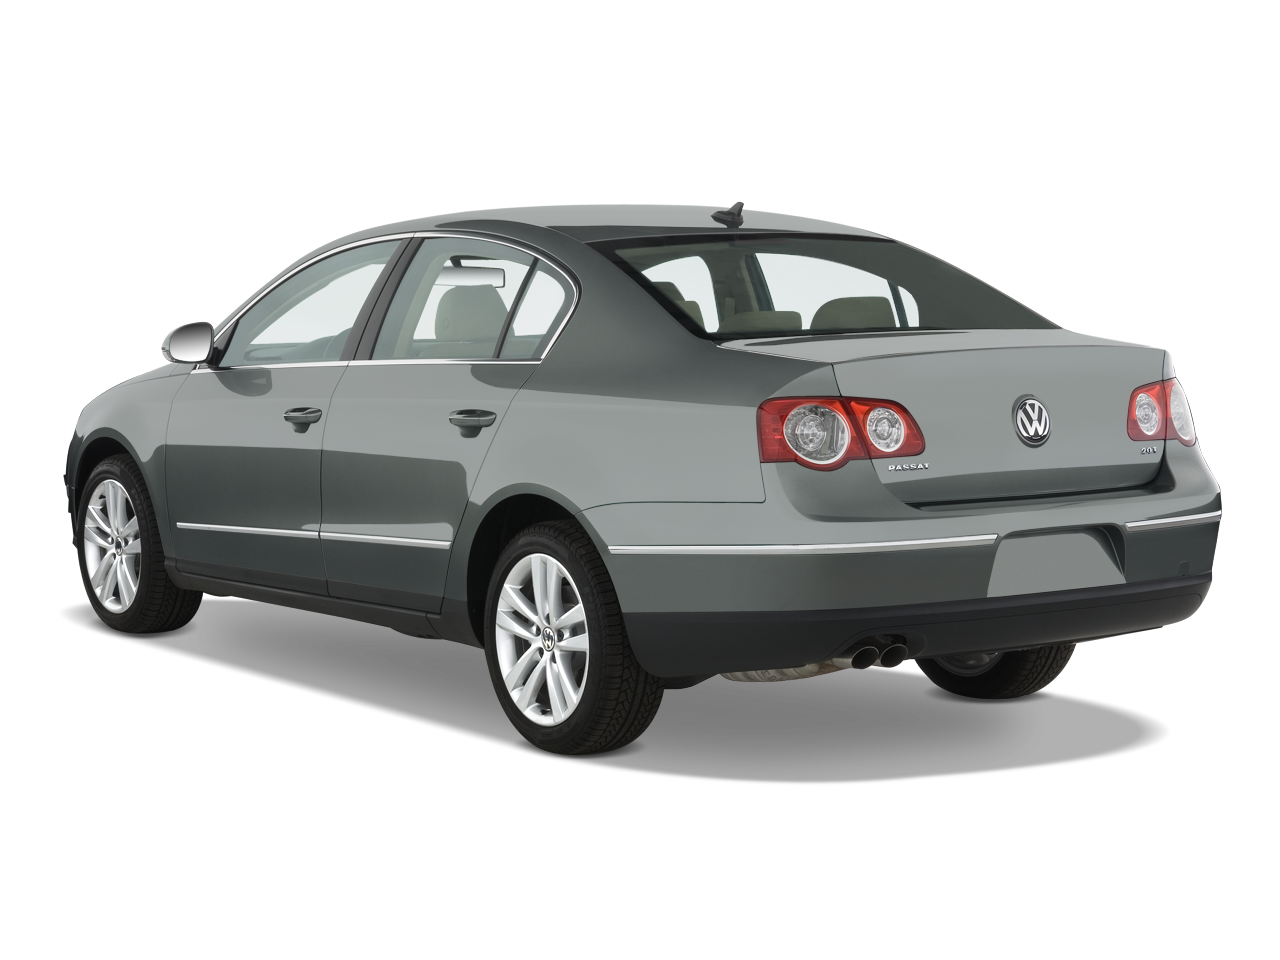 2008 volkswagen passat 2 0t lux volkswagen luxury sedan review automobile magazine. Black Bedroom Furniture Sets. Home Design Ideas